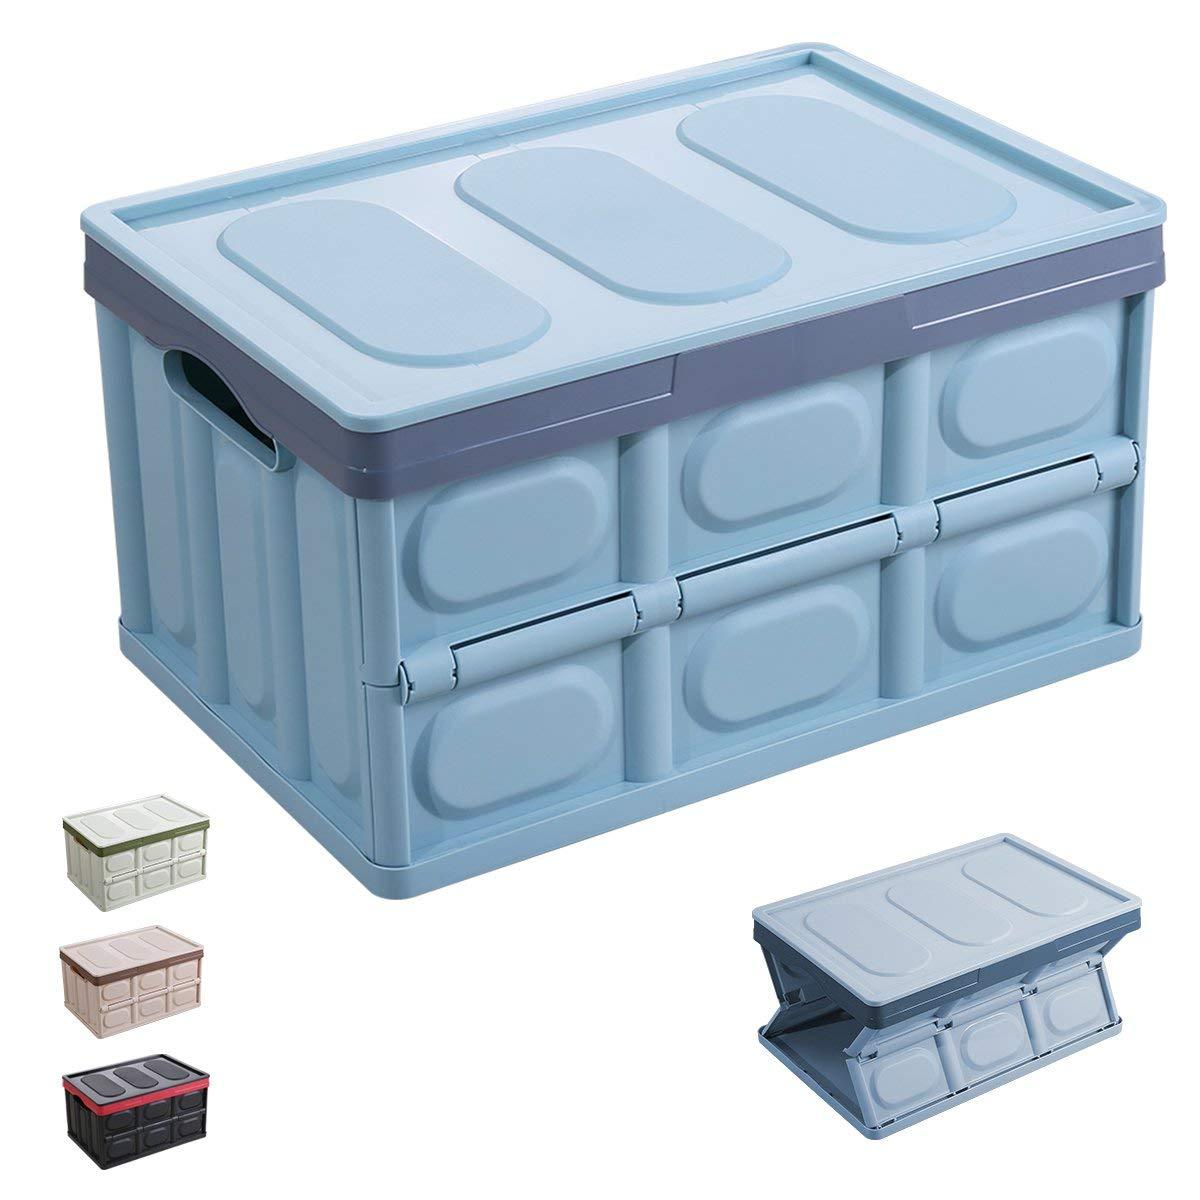 Cheap Clear Plastic Storage Bins, Find Clear Plastic Storage ...